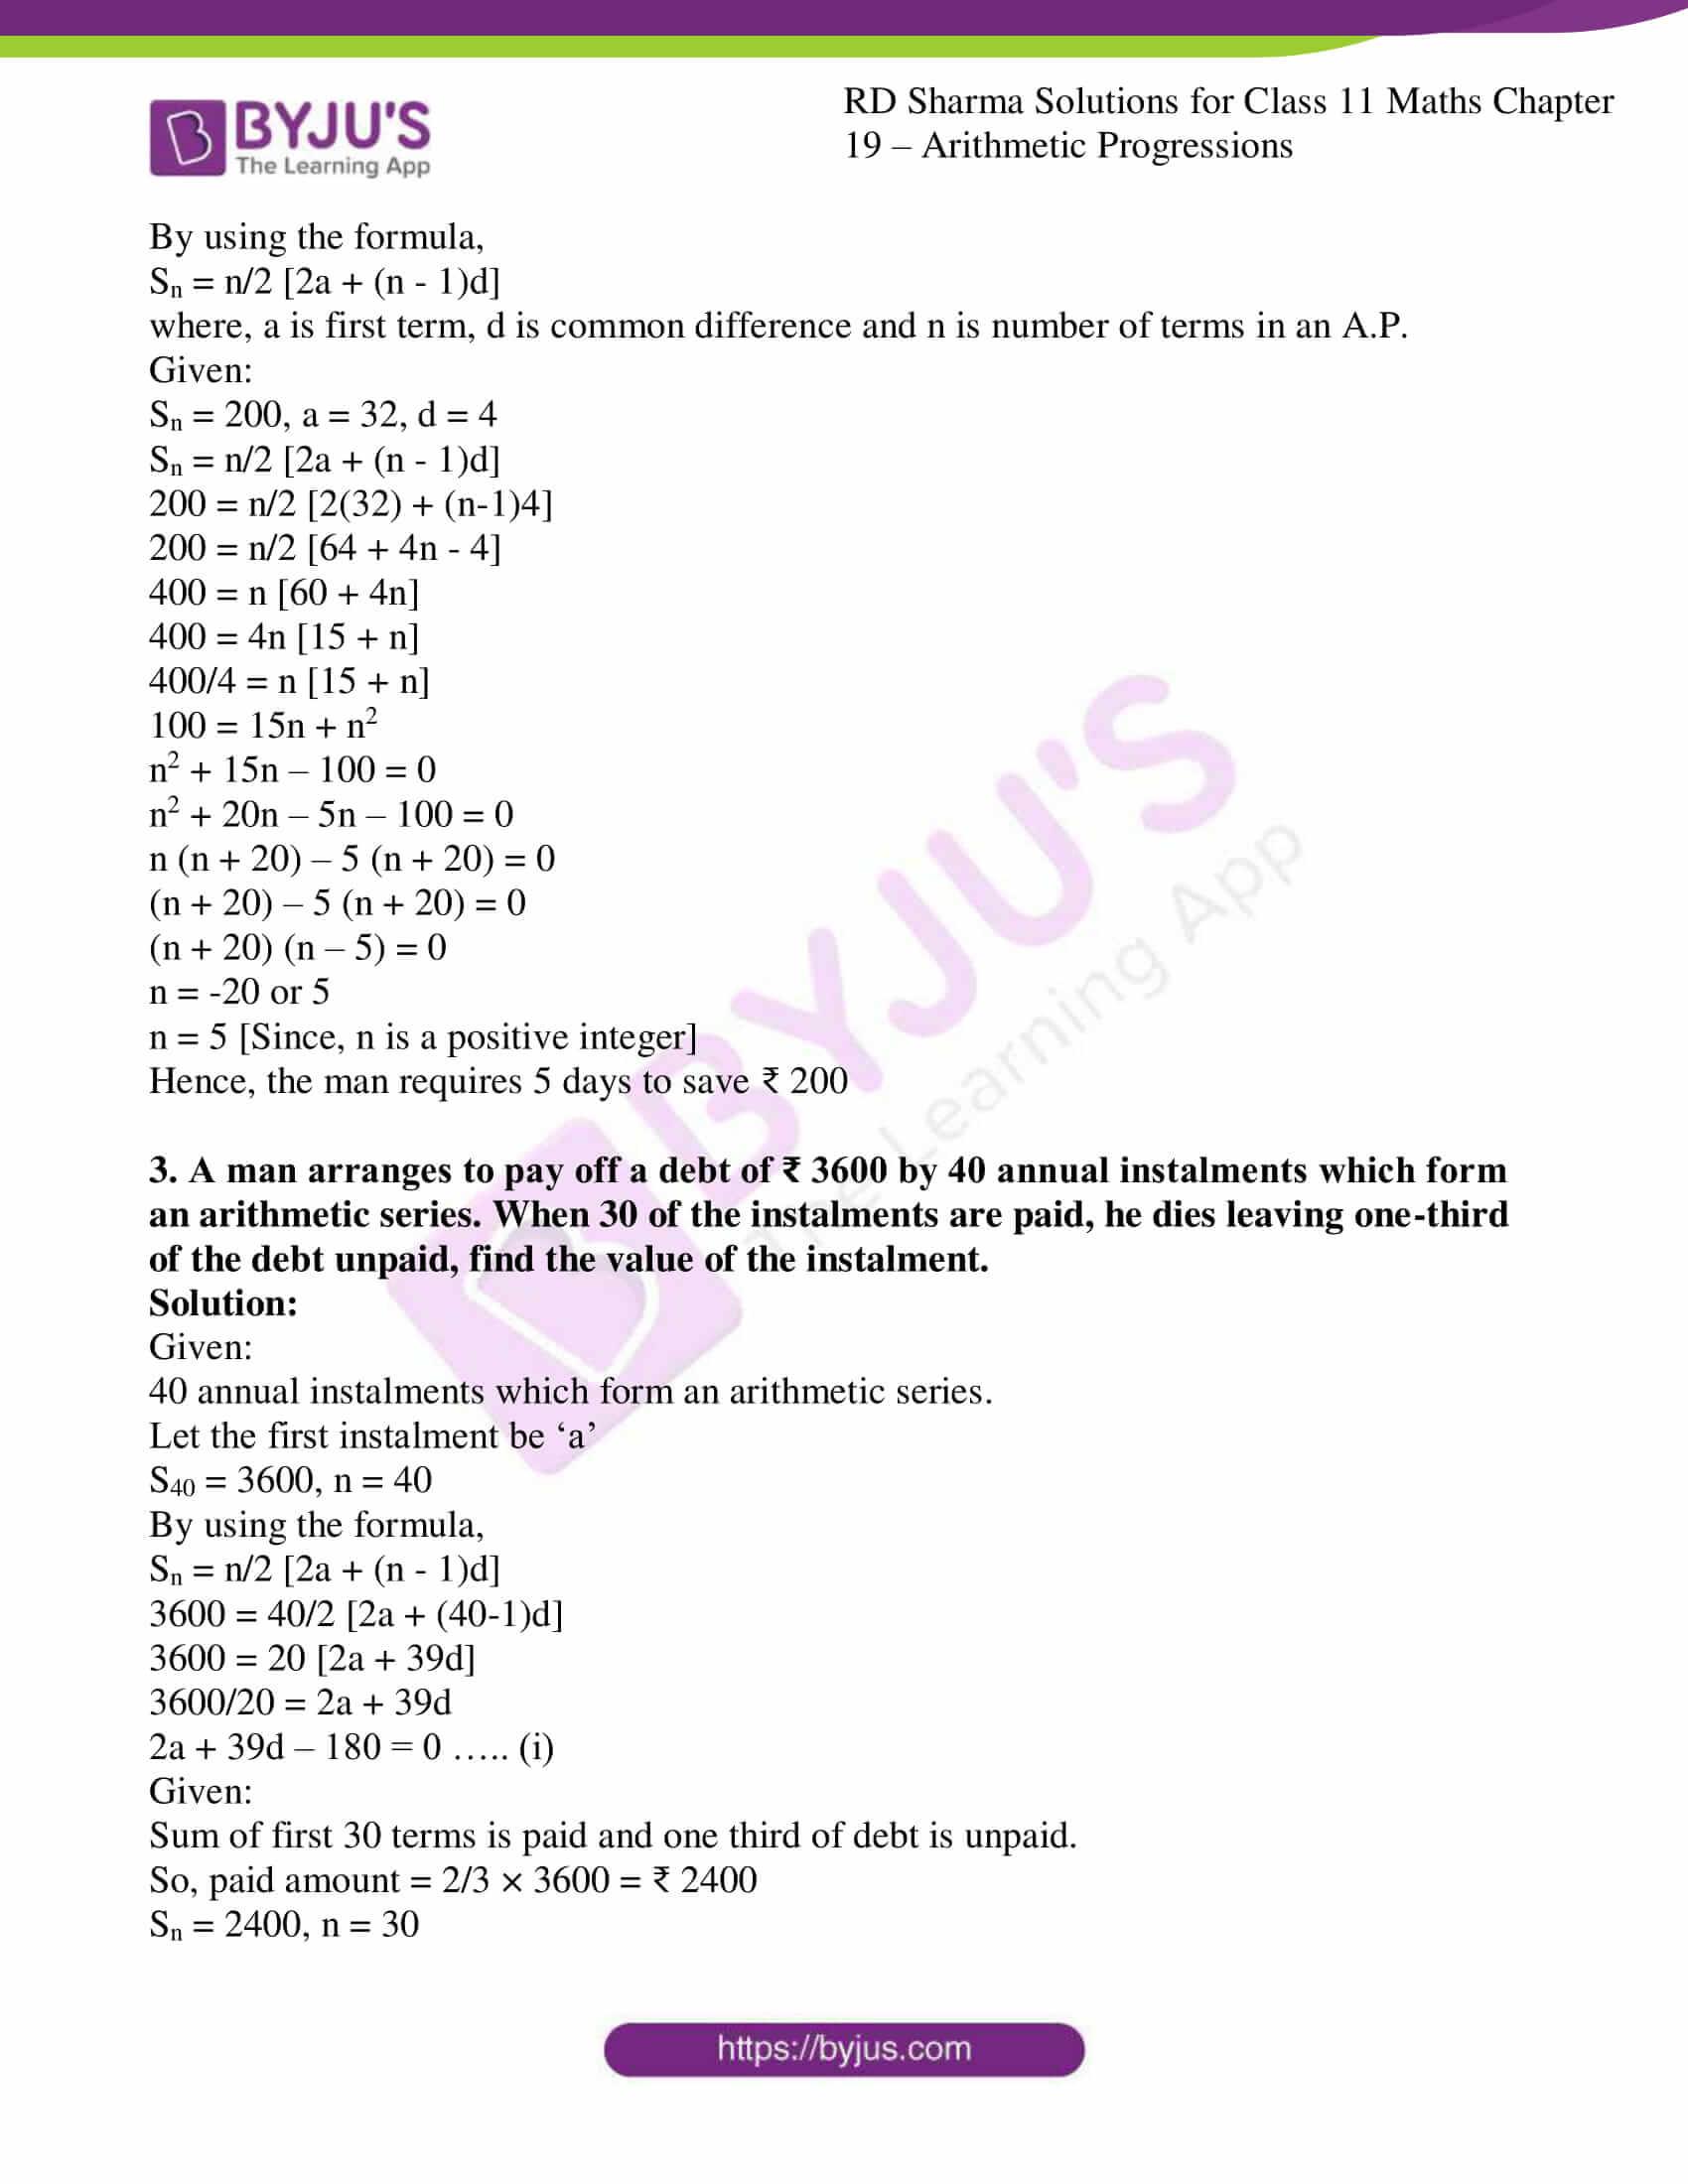 rd sharma class 11 maths ch 19 ex 7 2